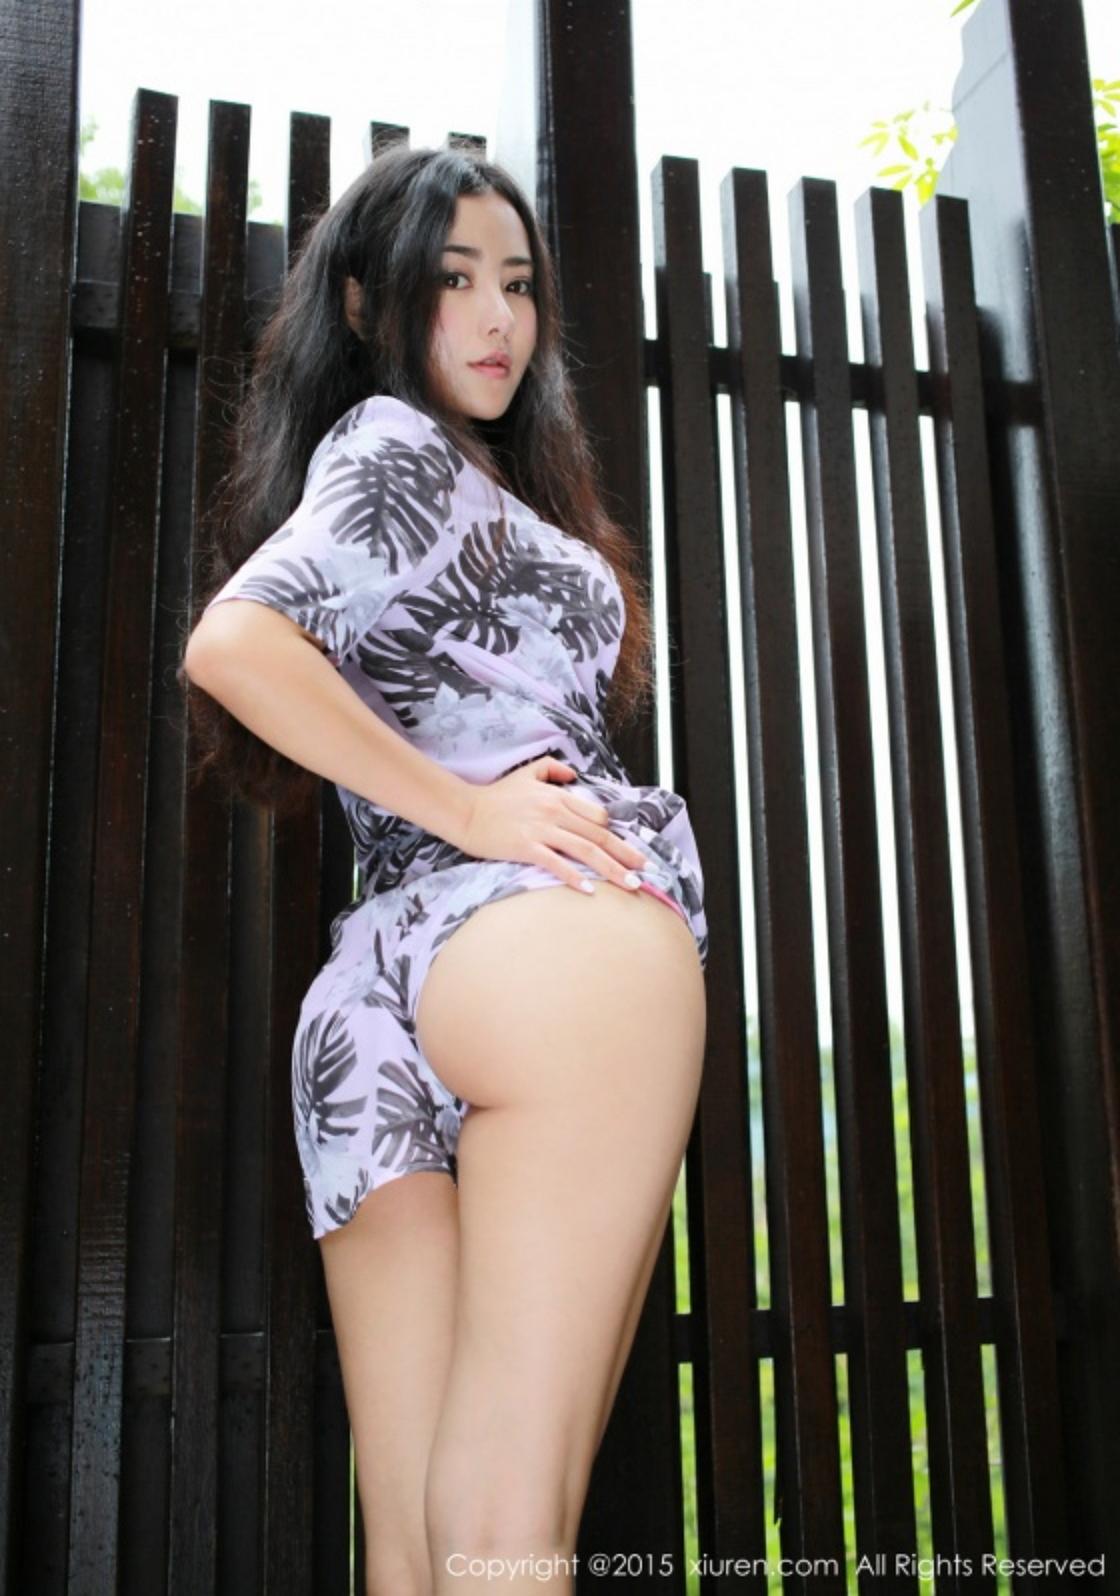 329 047 - Hot Photo XIUREN NO.329 Nude Girl